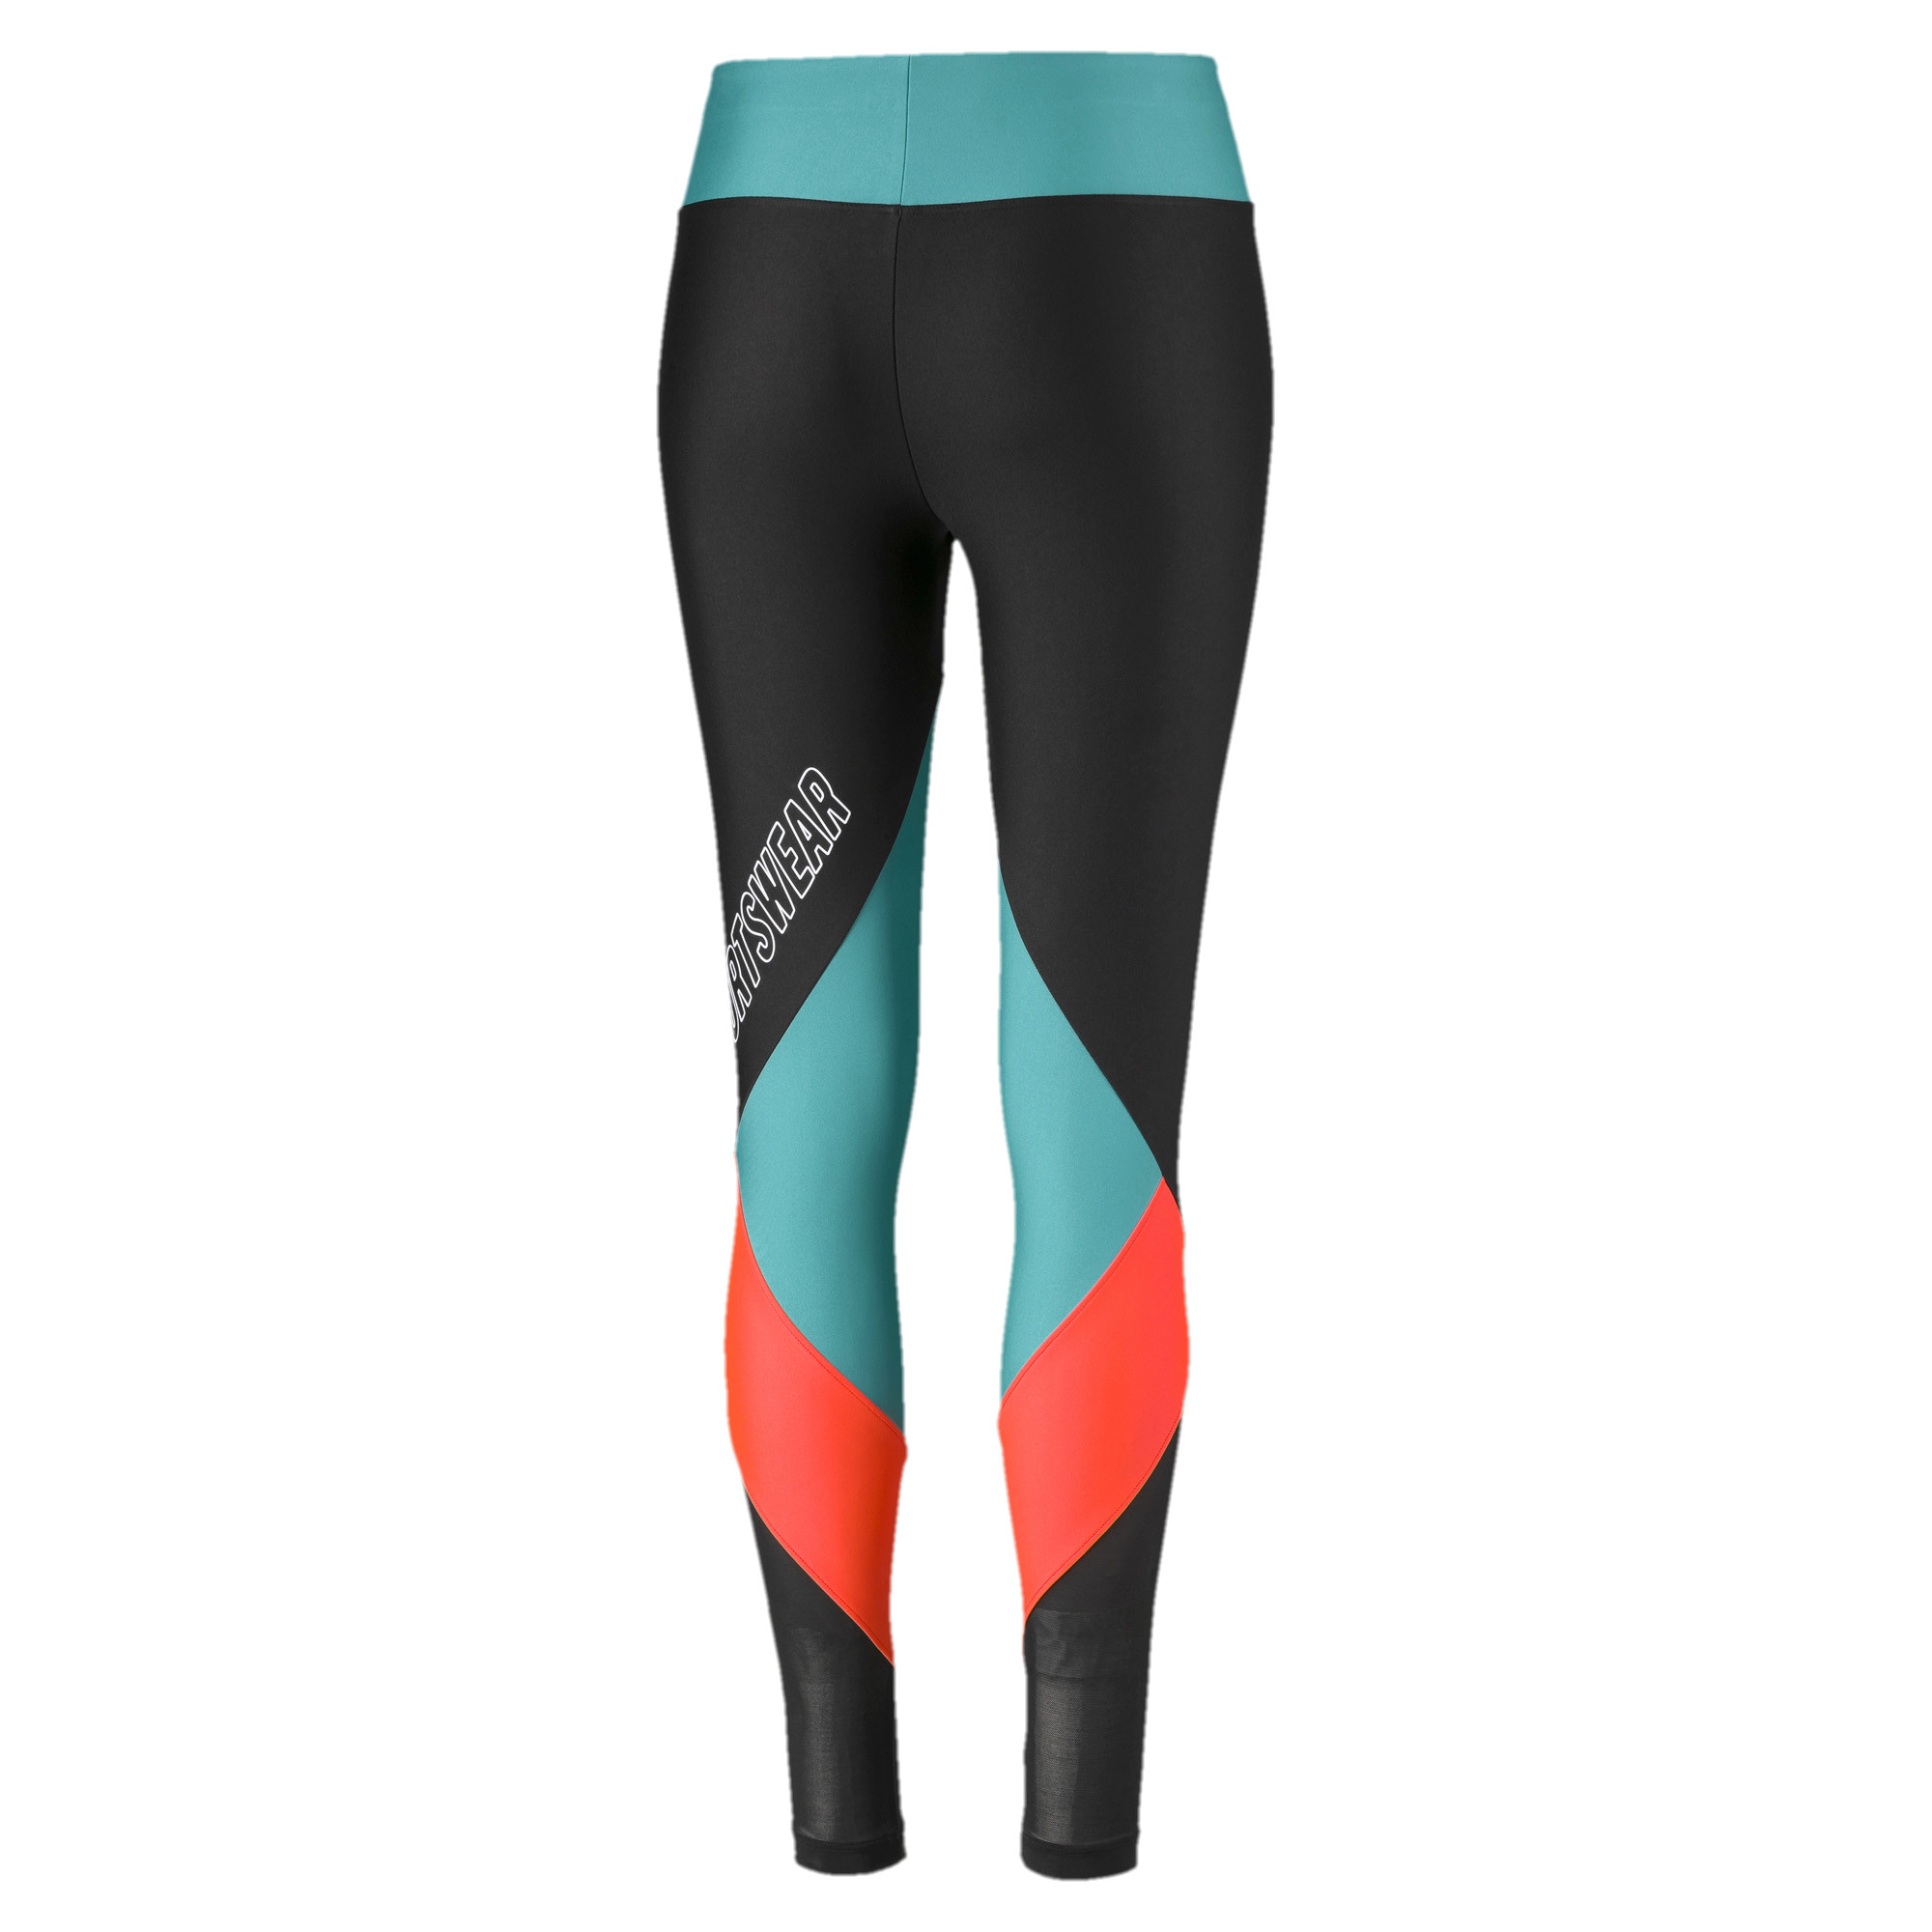 PUMA-luXTG-Women-s-Leggings-Sport-Classics thumbnail 8